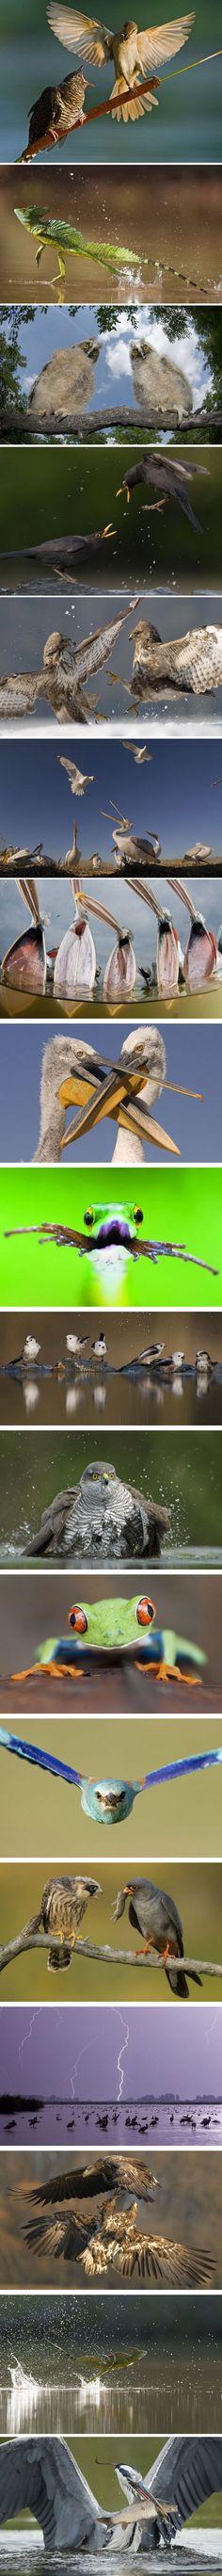 Wildlife Photographer Bence Mate